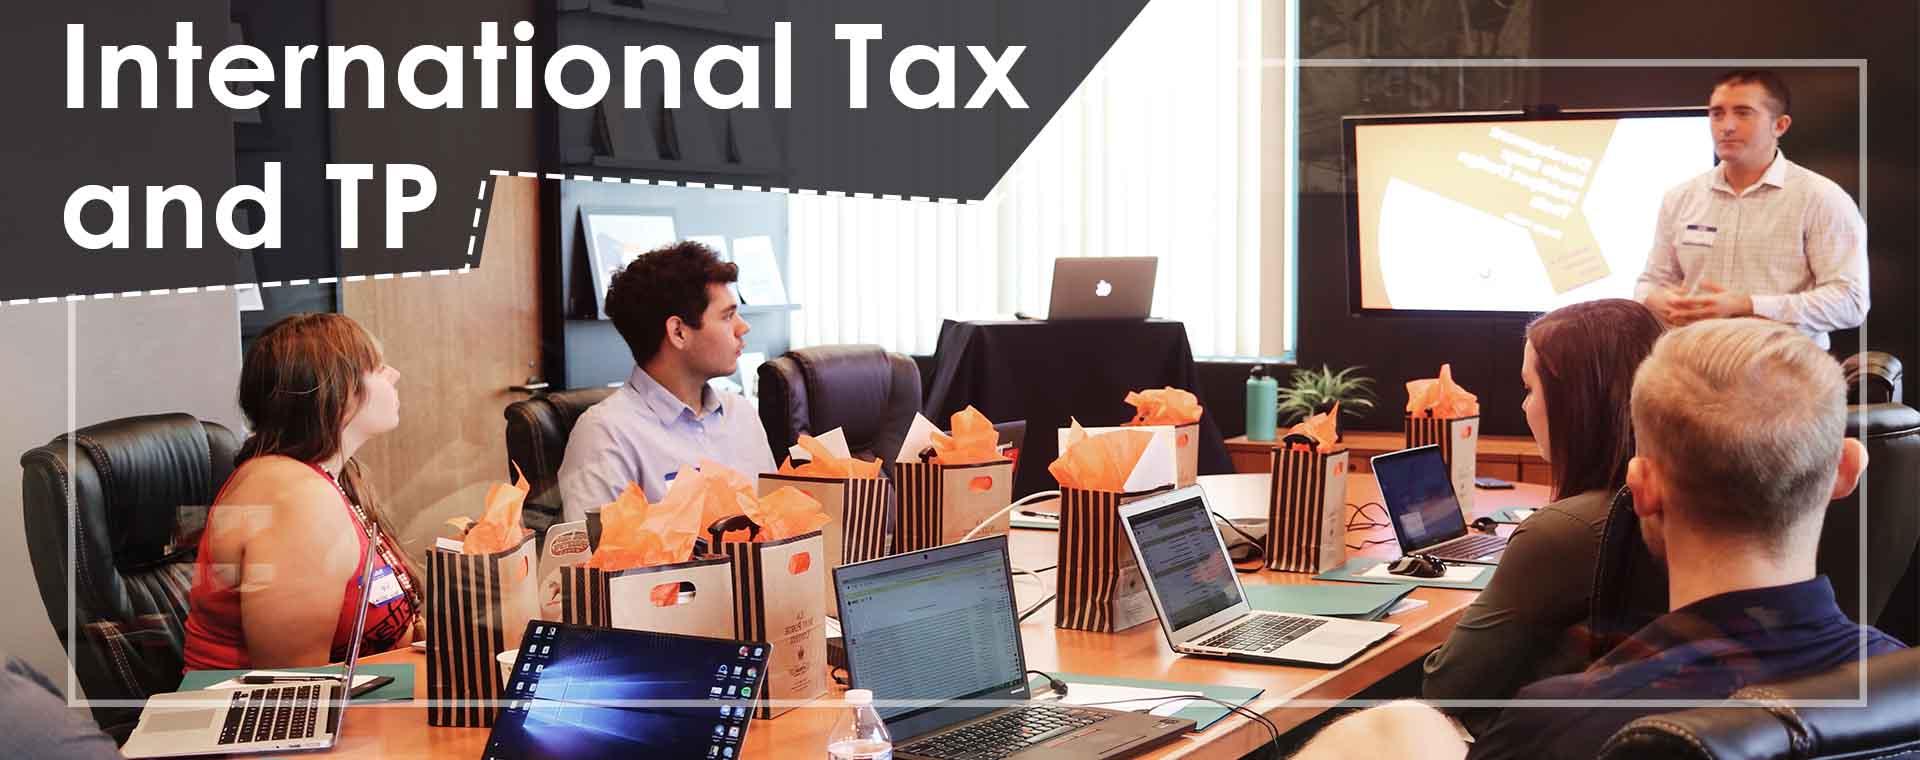 International Tax and tp